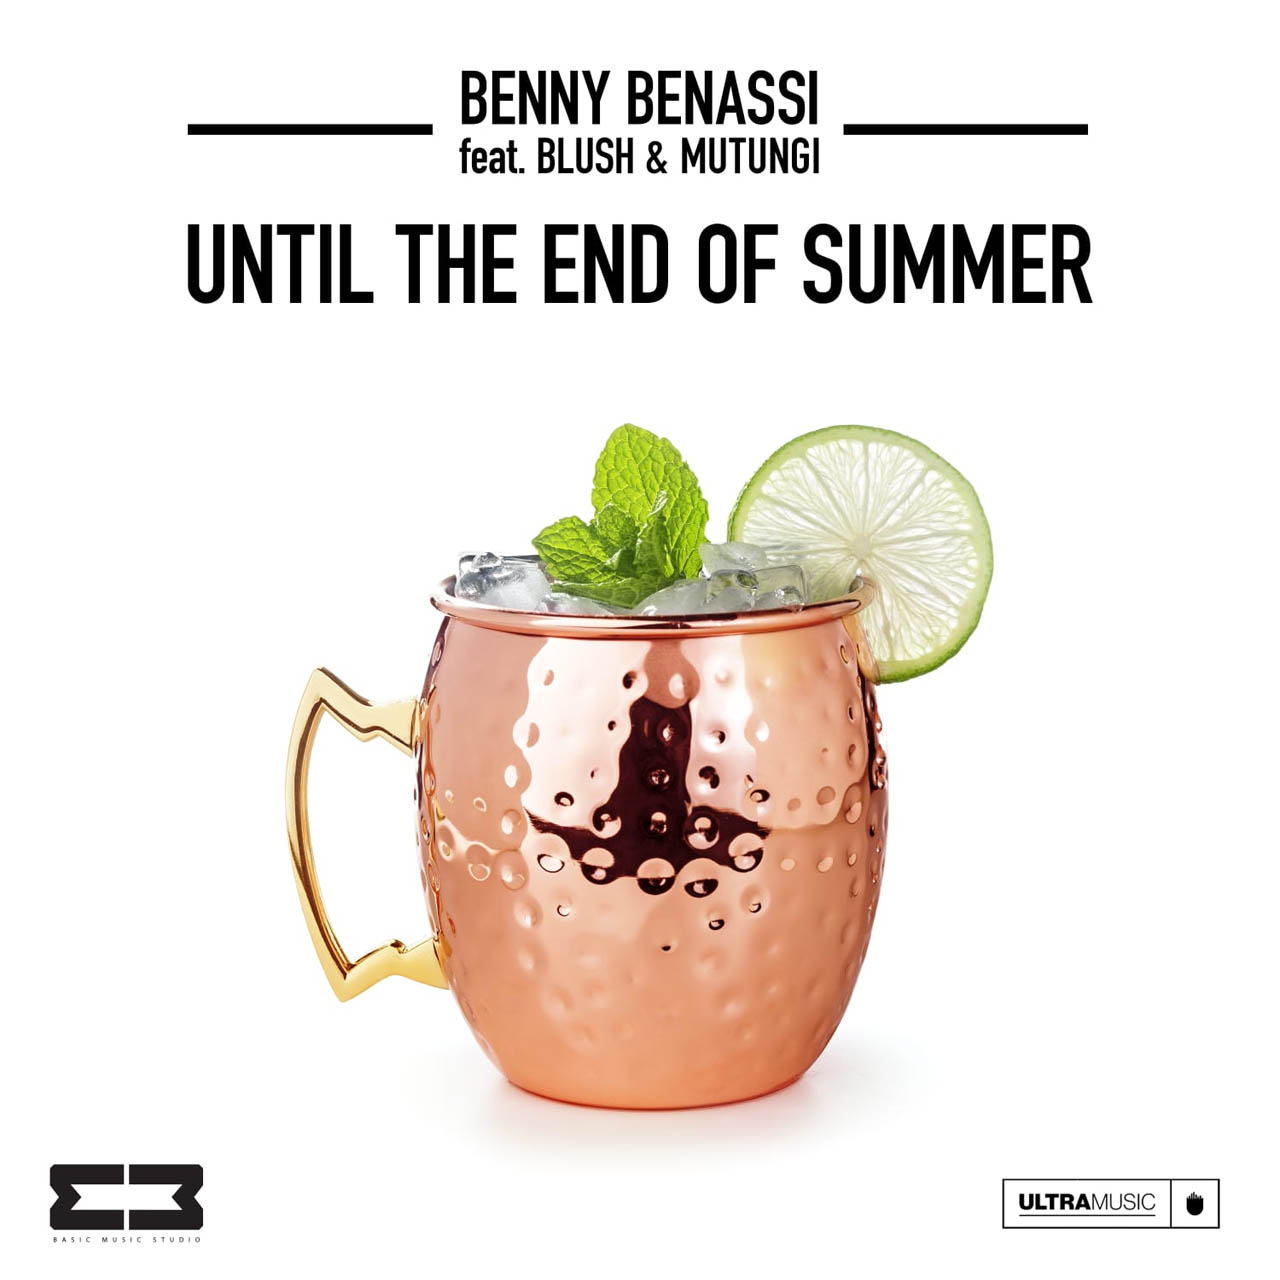 Unitl the End of Summer - Benny Benassi